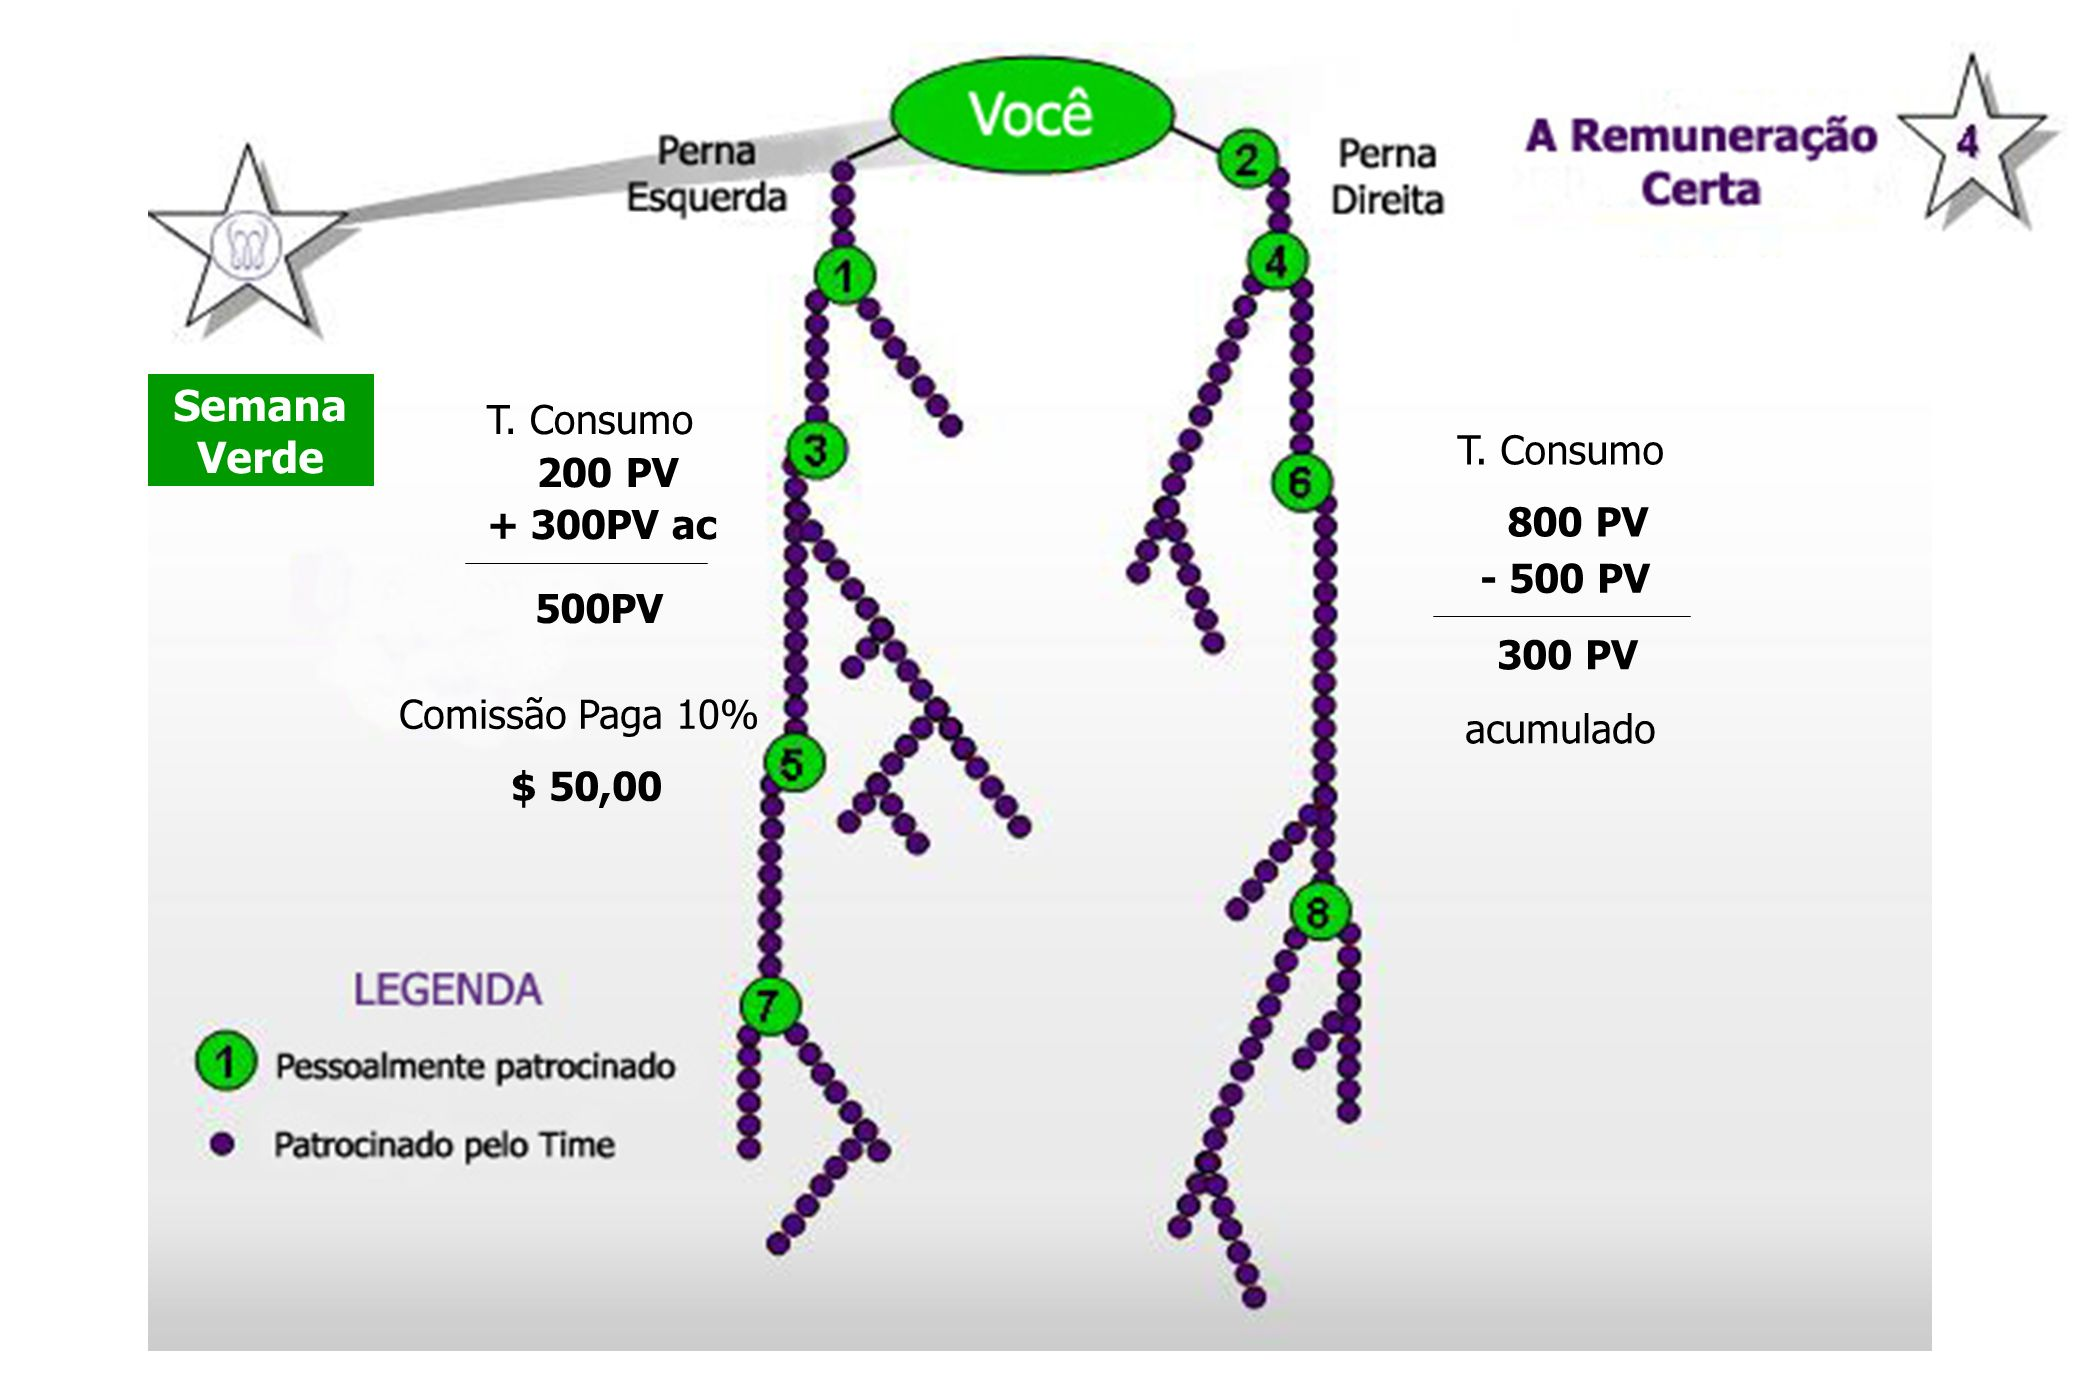 Semana Verde 300 PV T. Consumo 200 PV T. Consumo + 300PV ac 800 PV